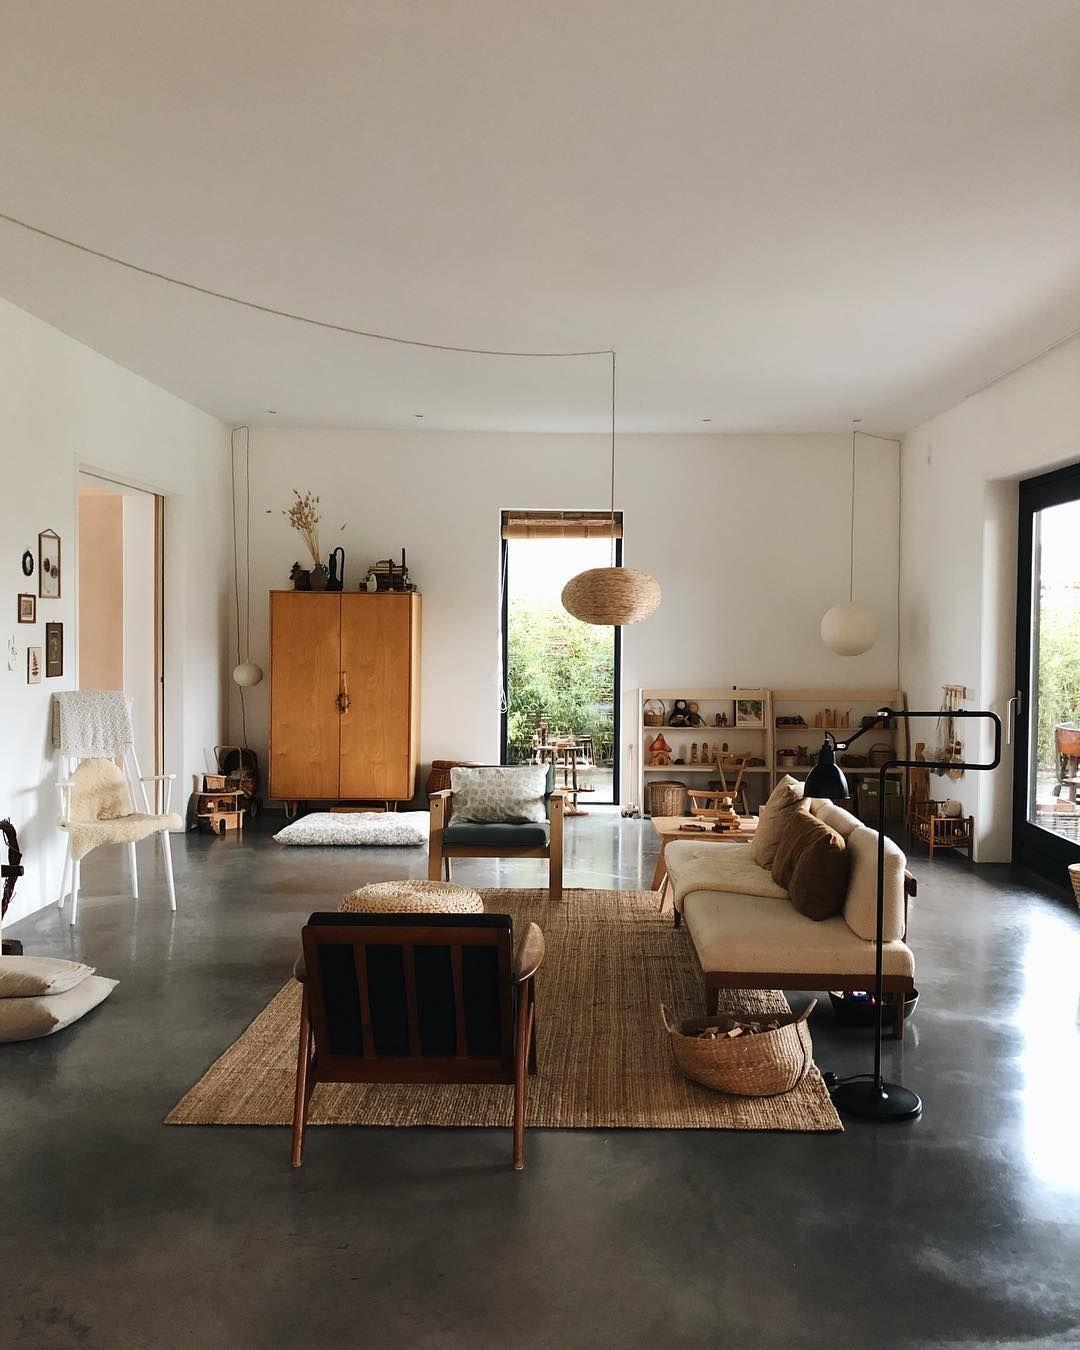 22+ Definition of rustic interior design inspirations